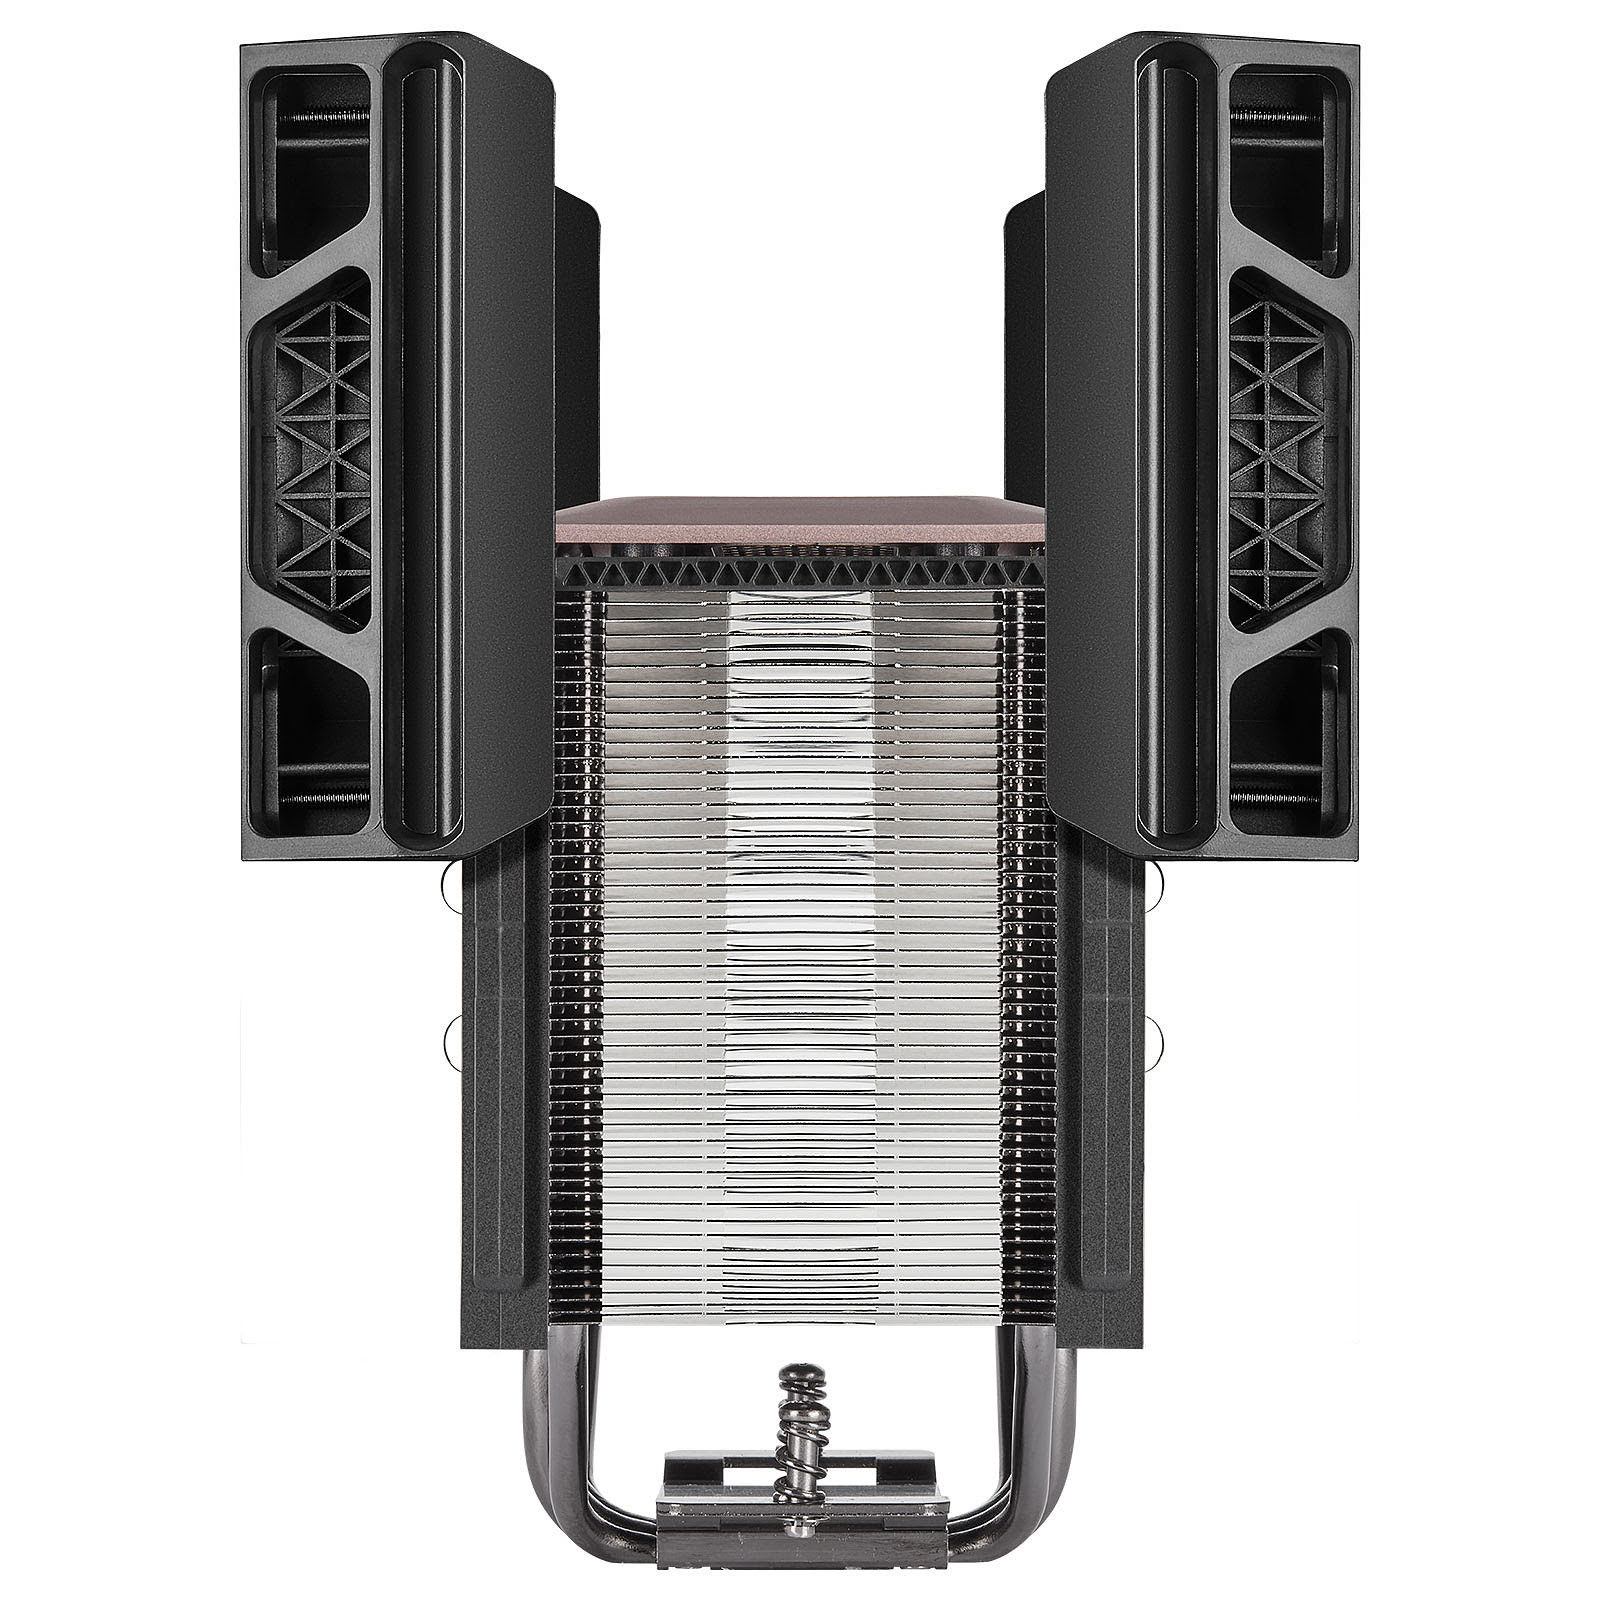 Corsair A500 Air Cooler - Ventilateur CPU Corsair - Cybertek.fr - 1